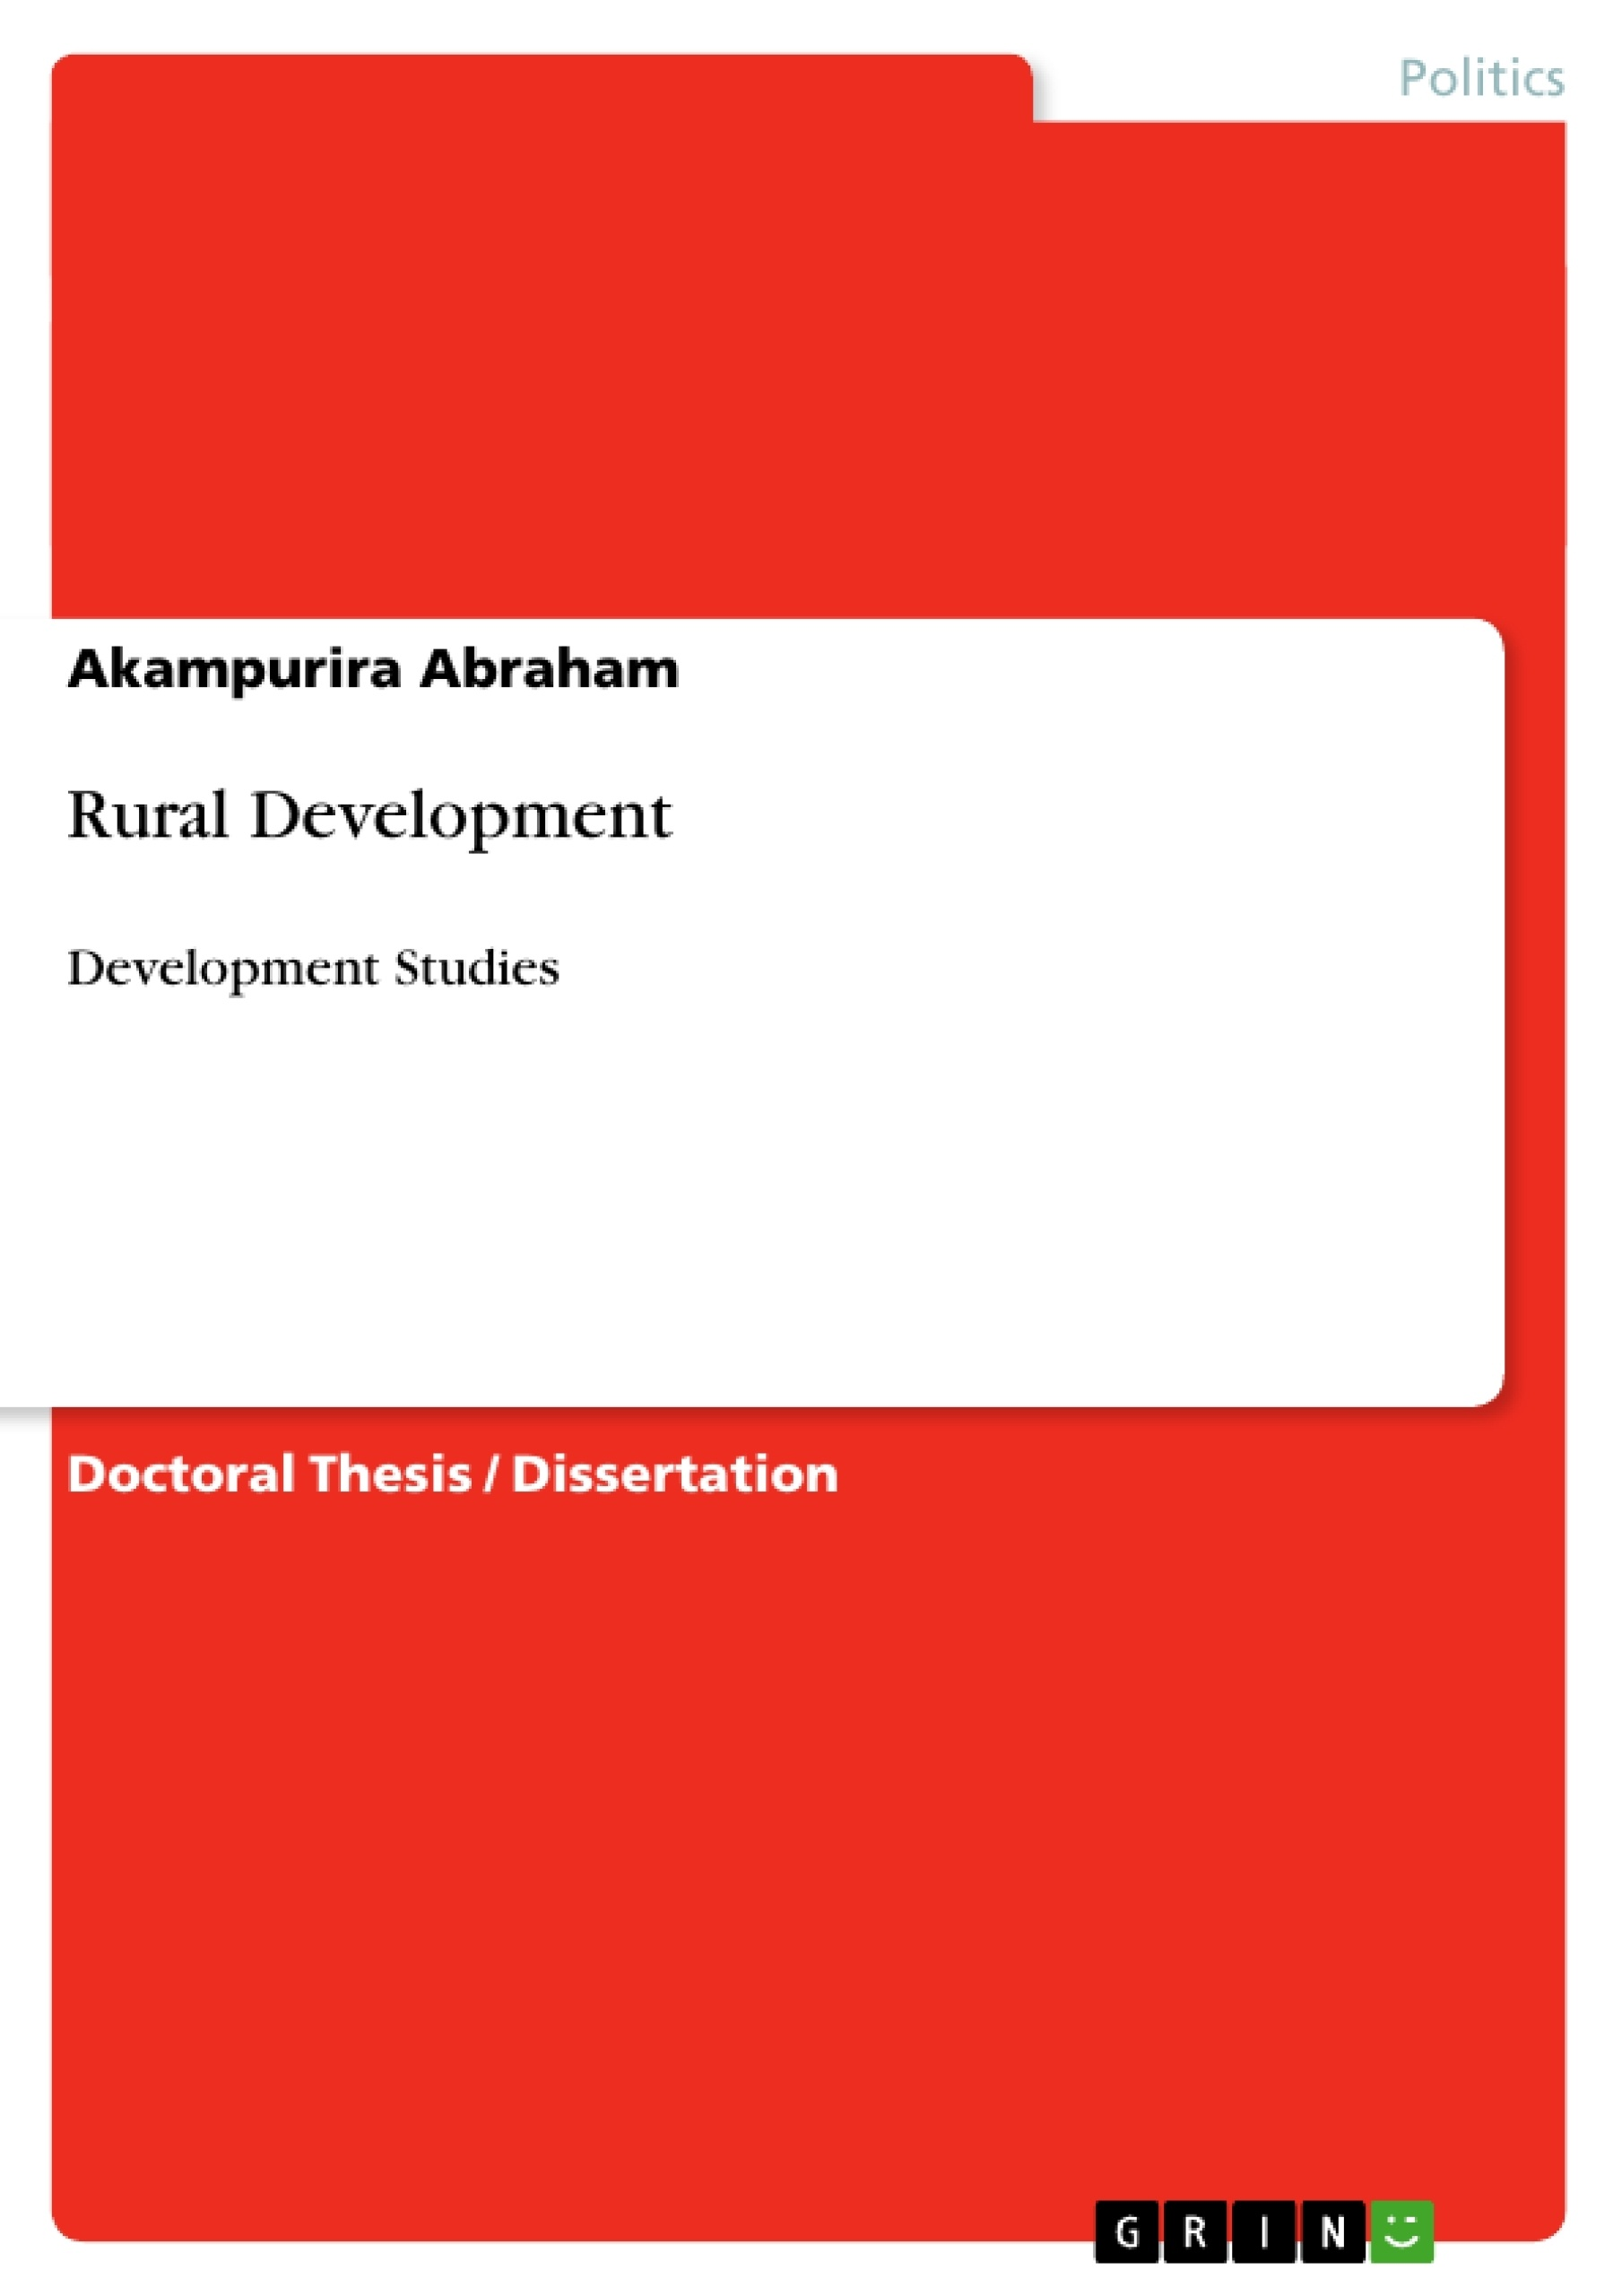 Title: Rural Development